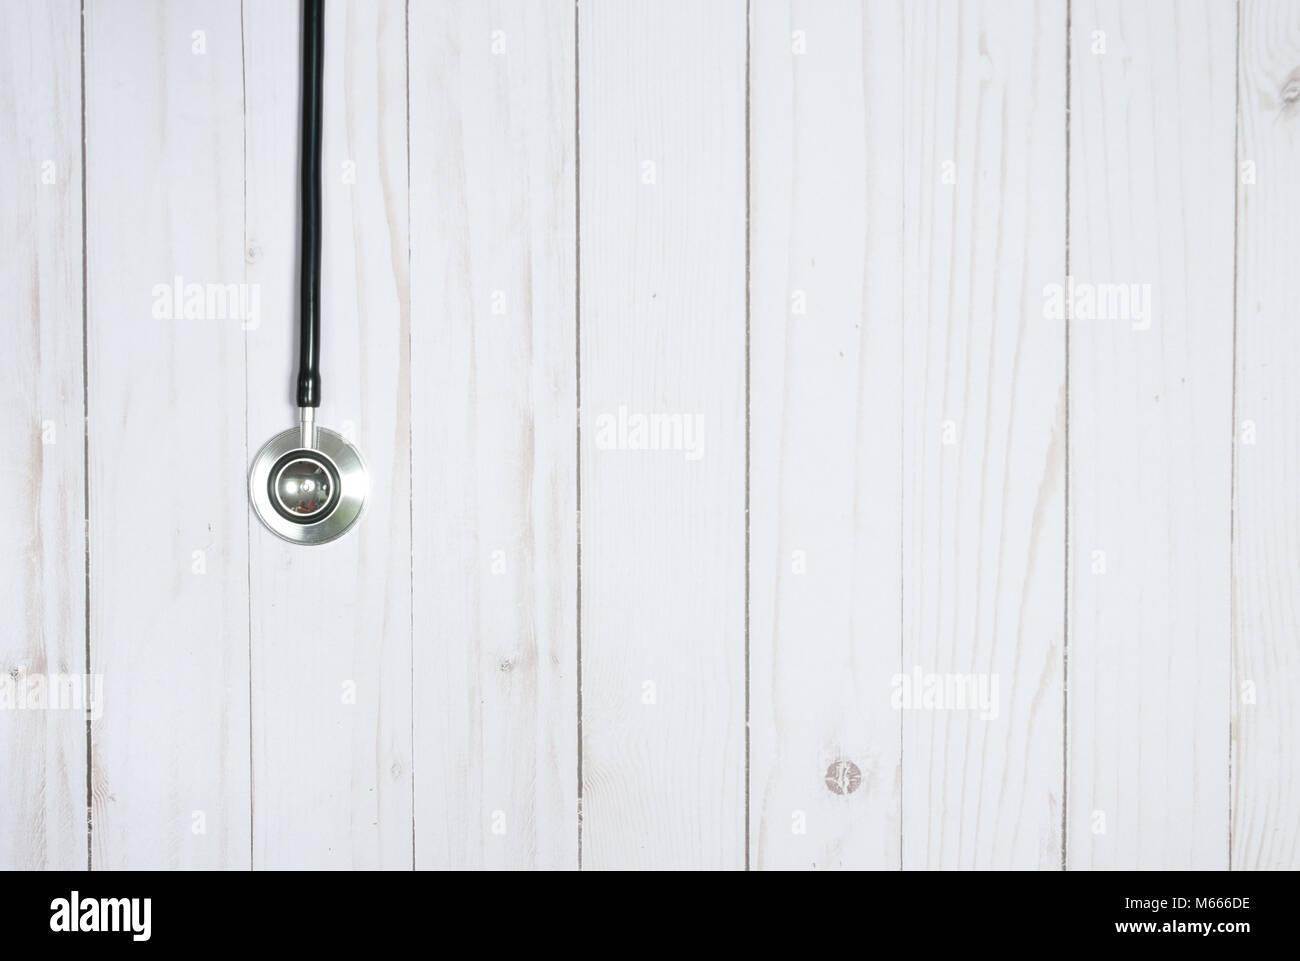 Medical stethoscope on white desk. Medicine concept - Stock Image